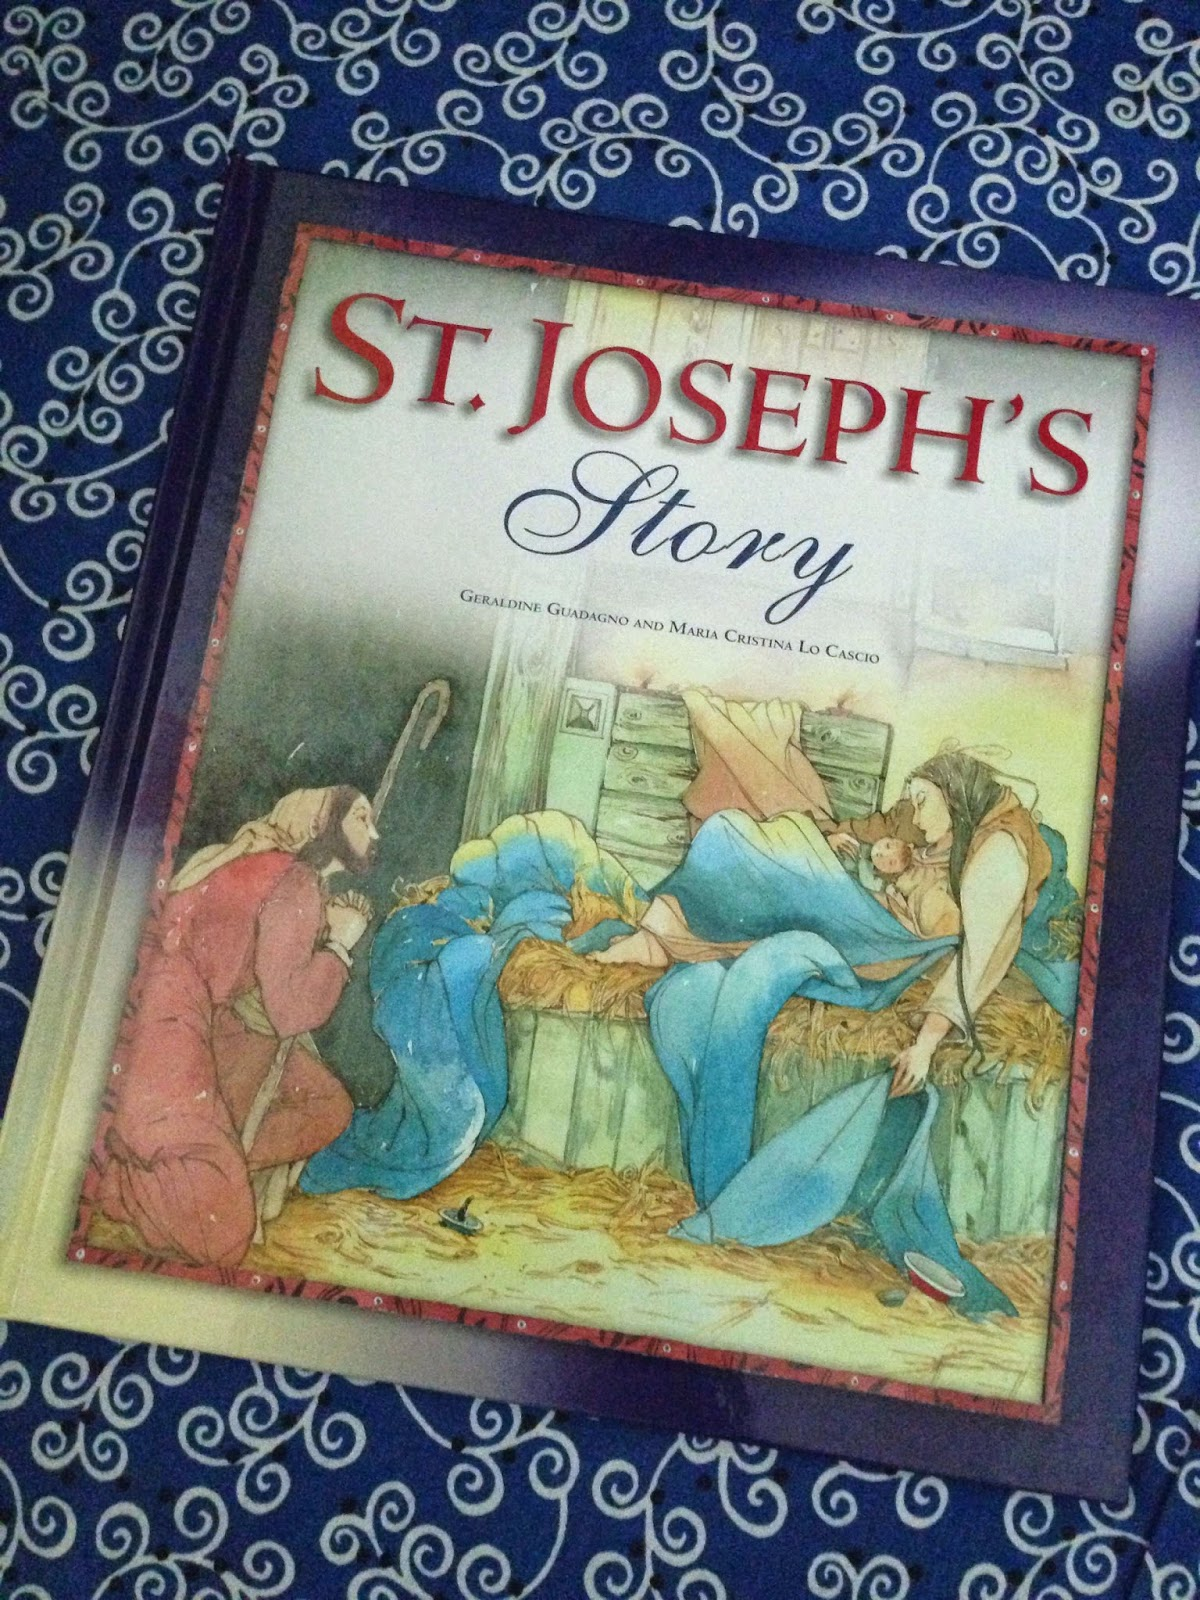 http://www.amazon.com/St-Josephs-Story-Geraldine-Guadagno/dp/1593251734